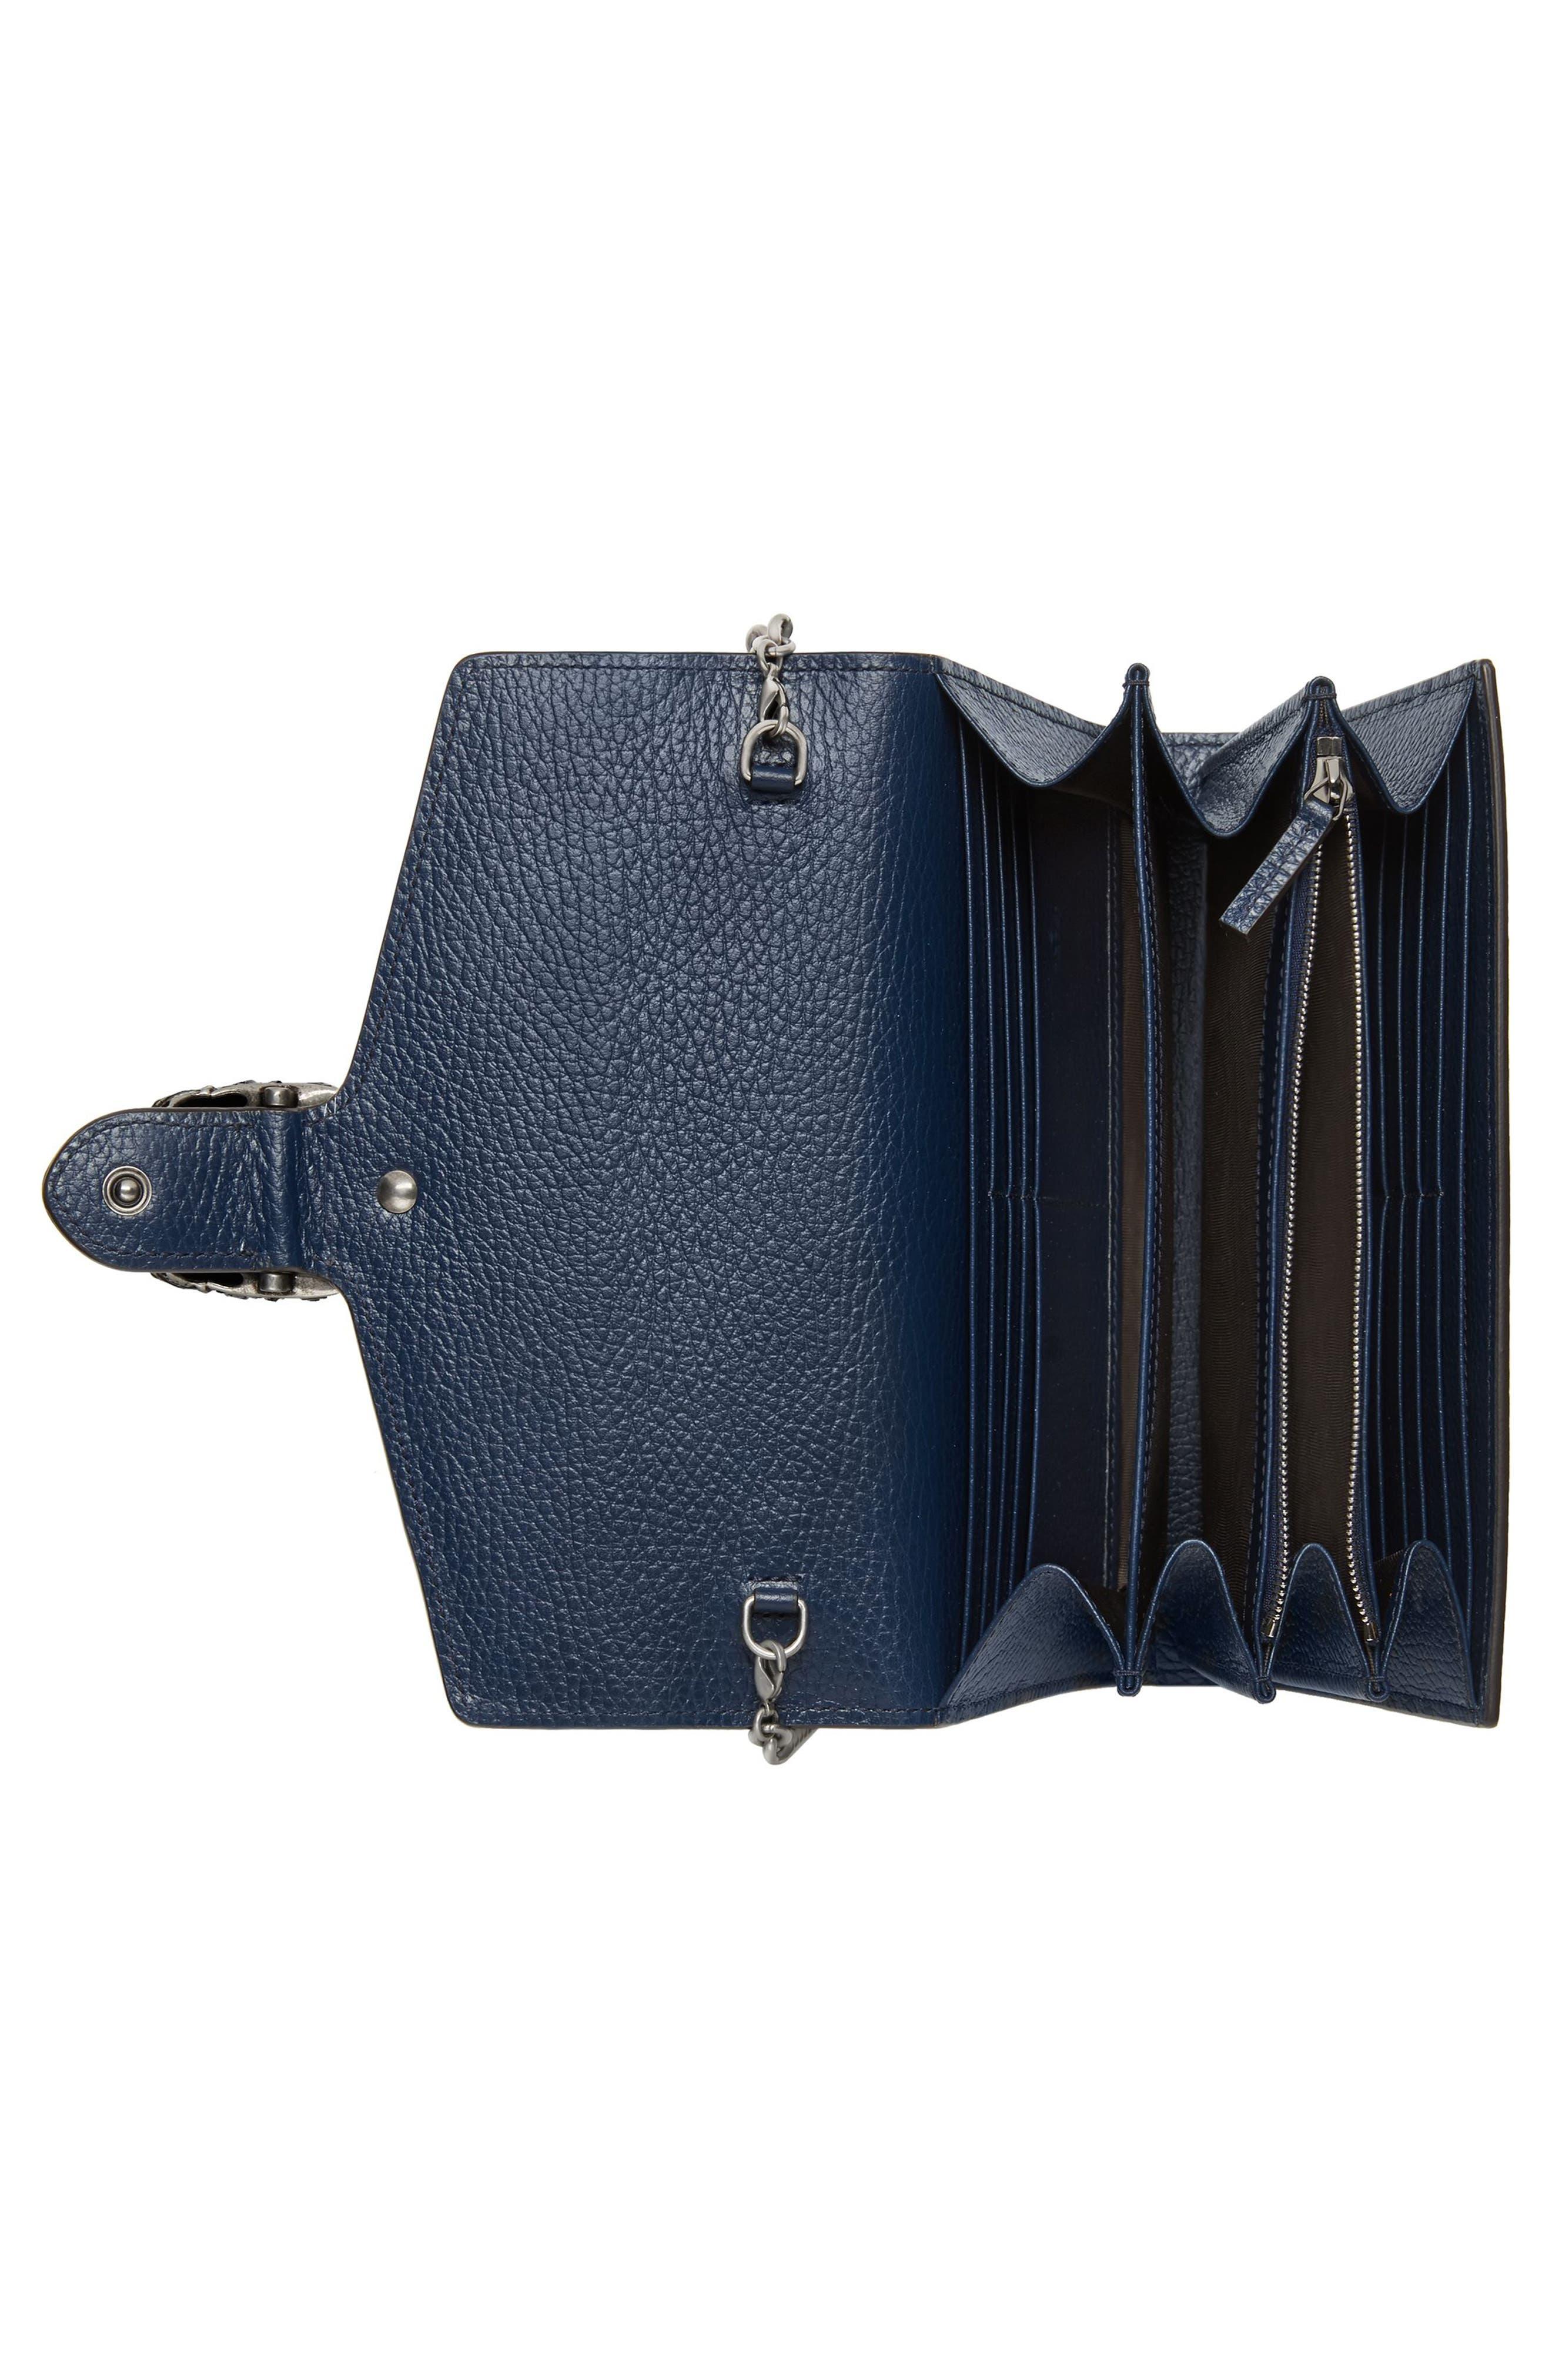 Dionysus Leather Wallet on a Chain,                             Alternate thumbnail 2, color,                             BLU AGATA/ BLACK DIAMOND